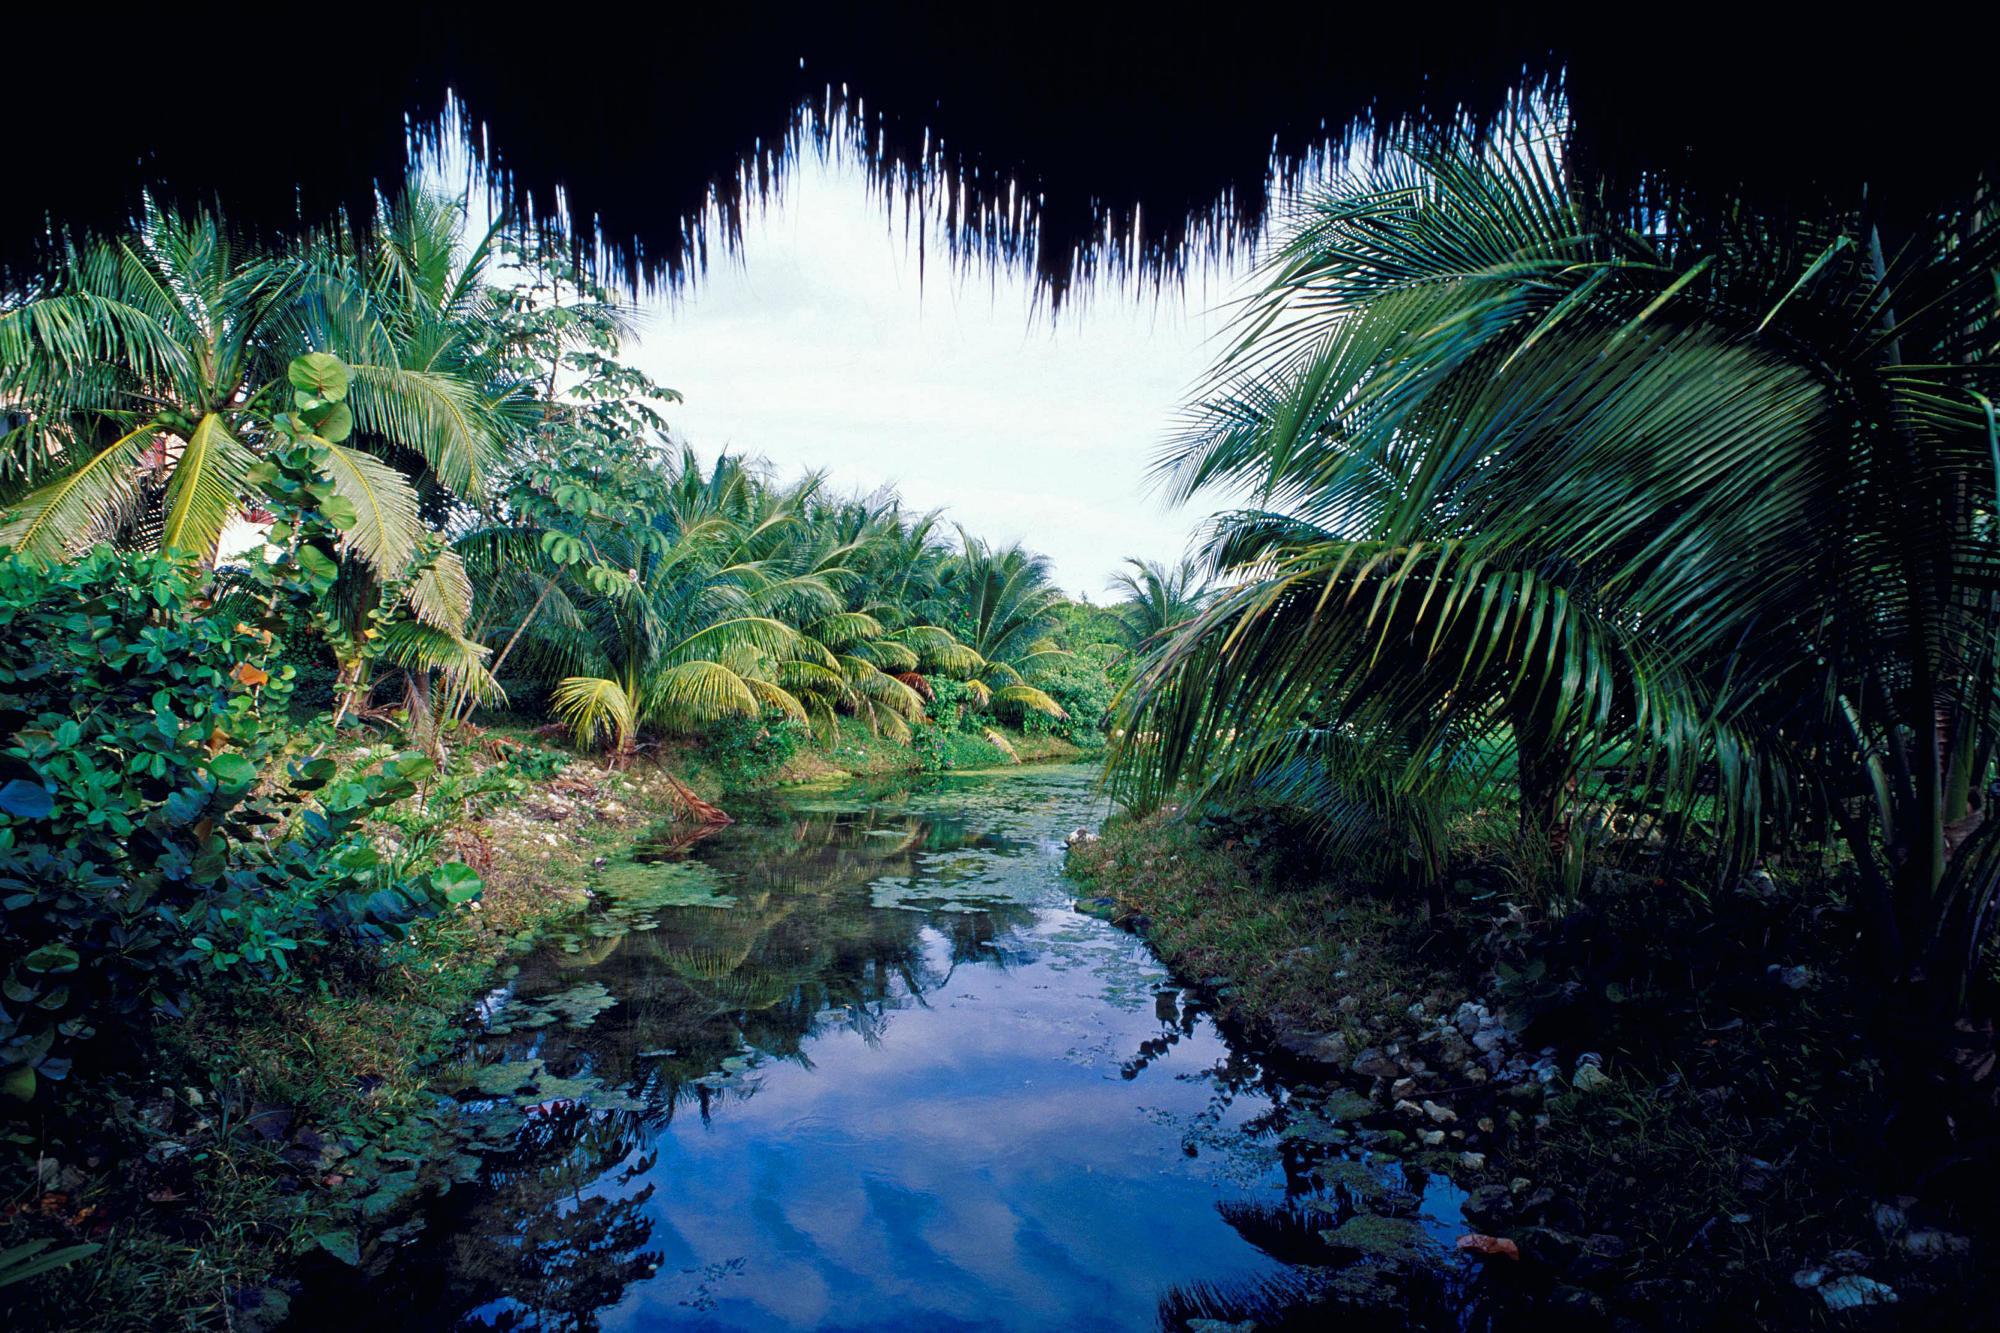 Nature scene in Mexico, Yucatan wallpapers